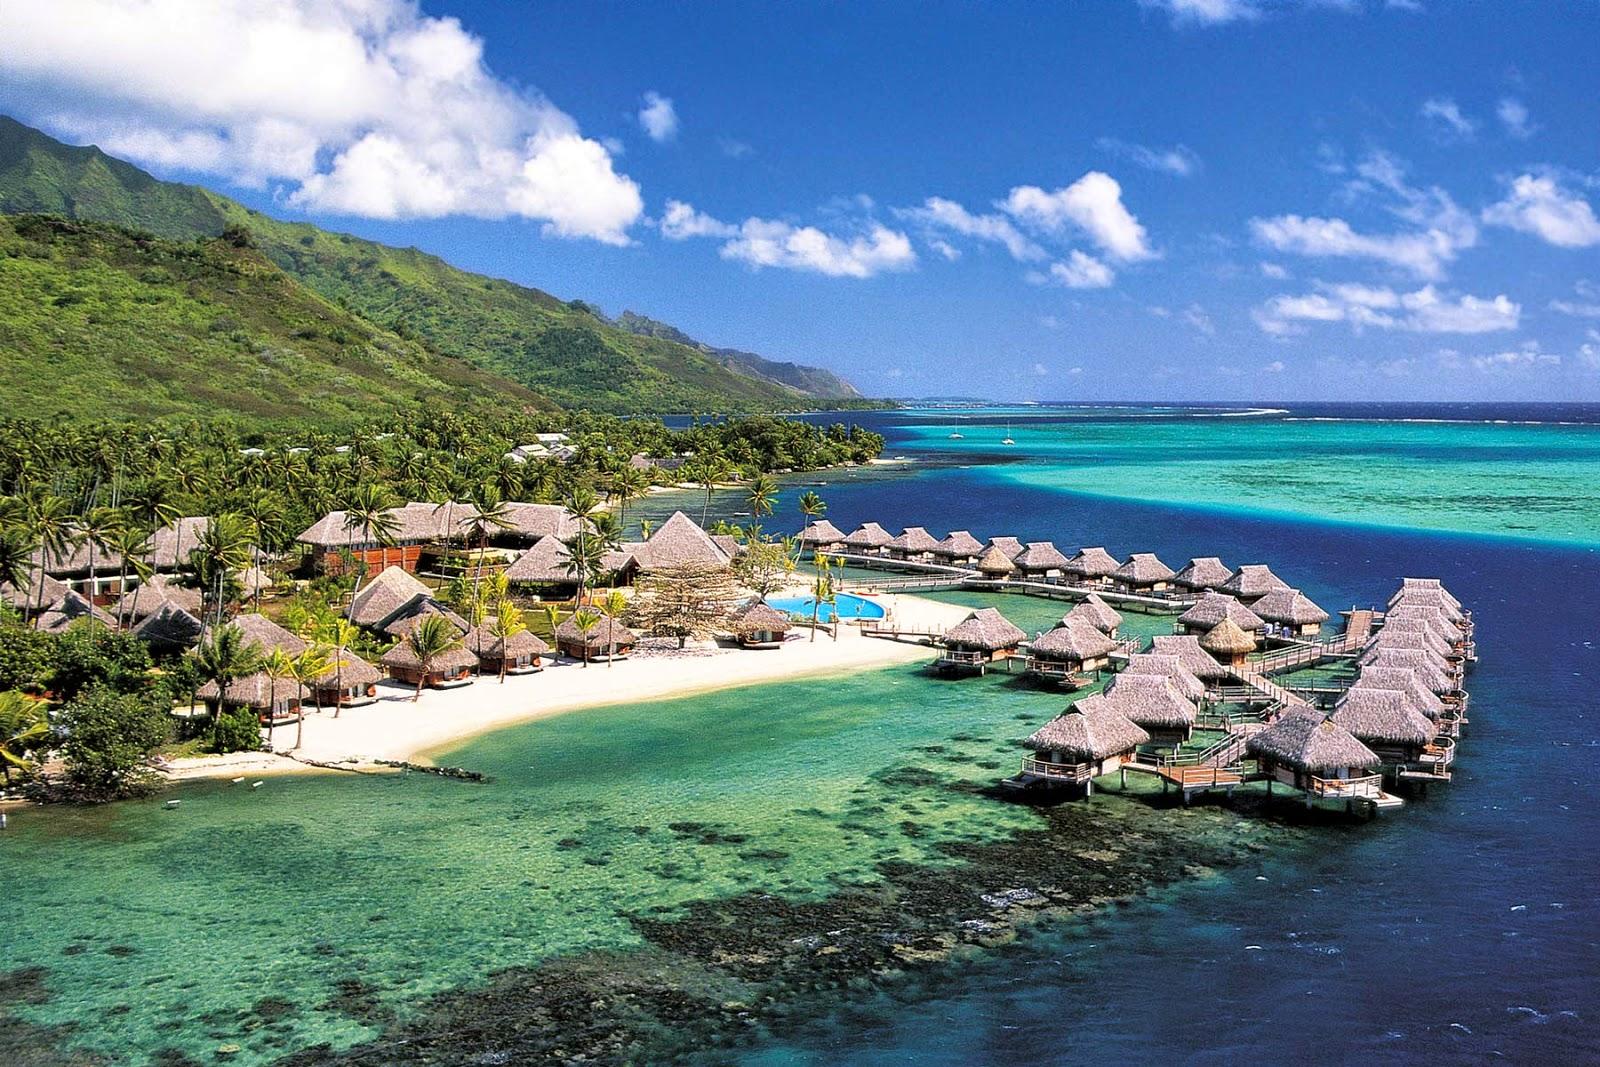 Tempat Tour Wisata ke Lombok Komplit4 Hari 3 Malam